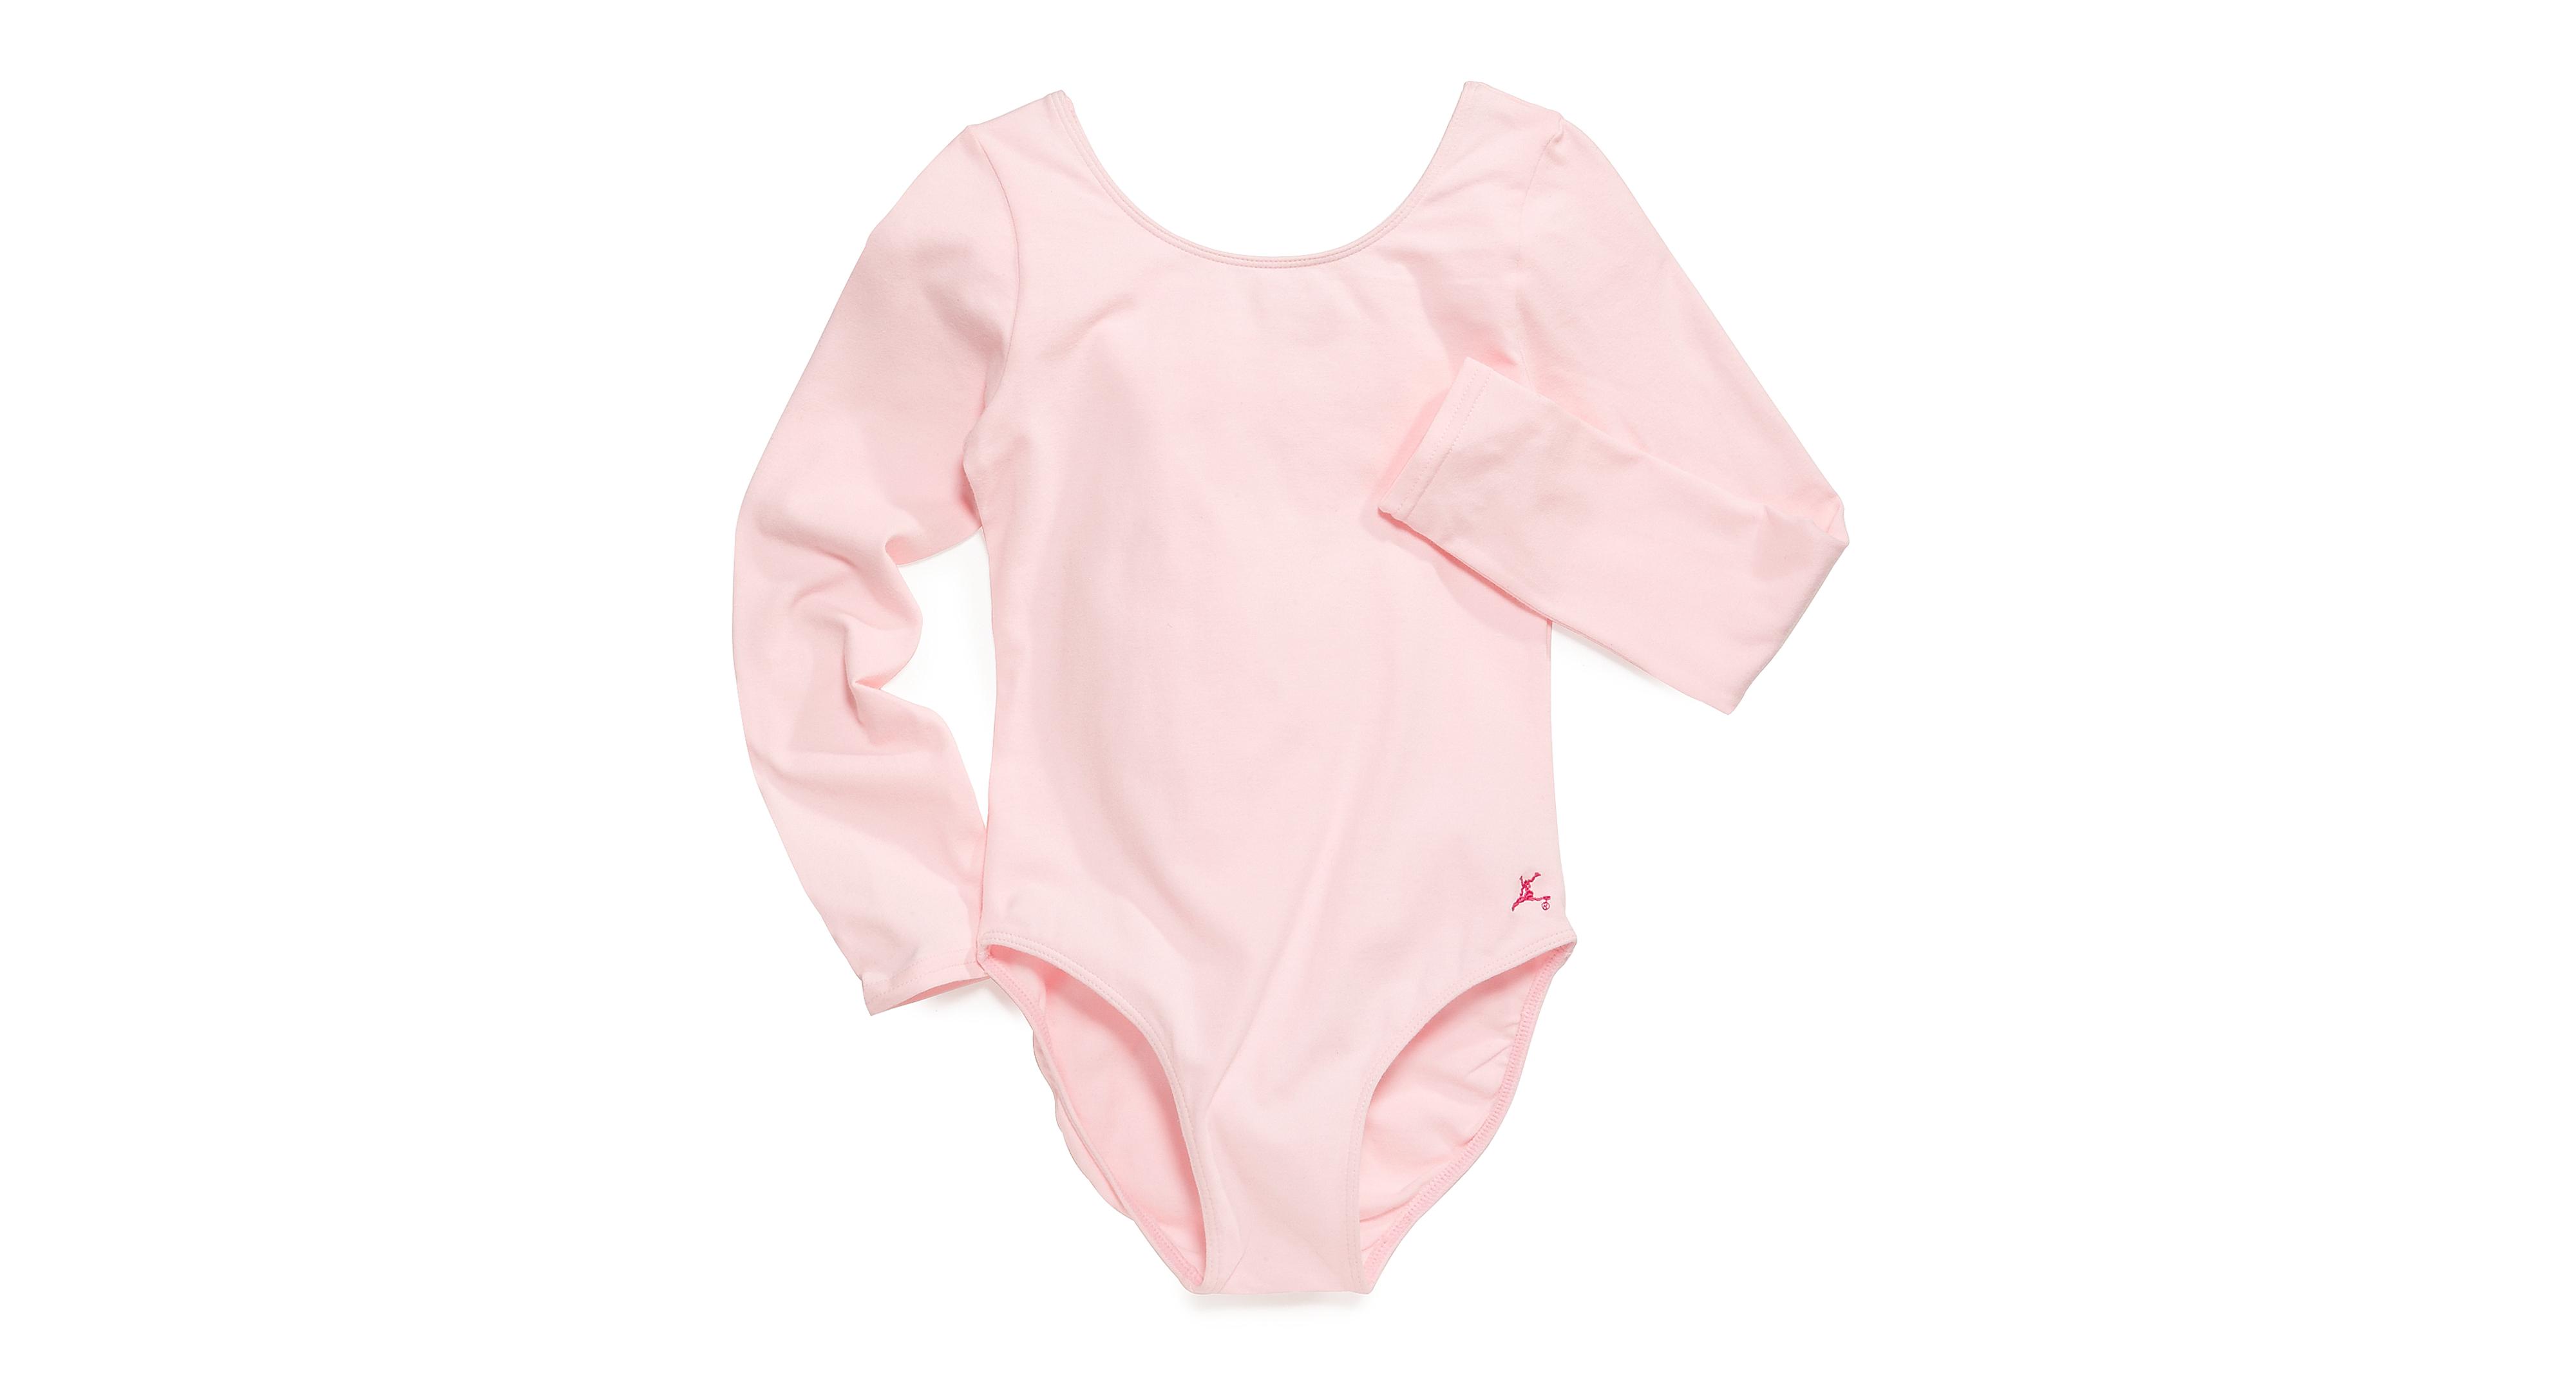 Future Star by Capezio Girls' or Little Girls' Basic Long-Sleeve Leotard